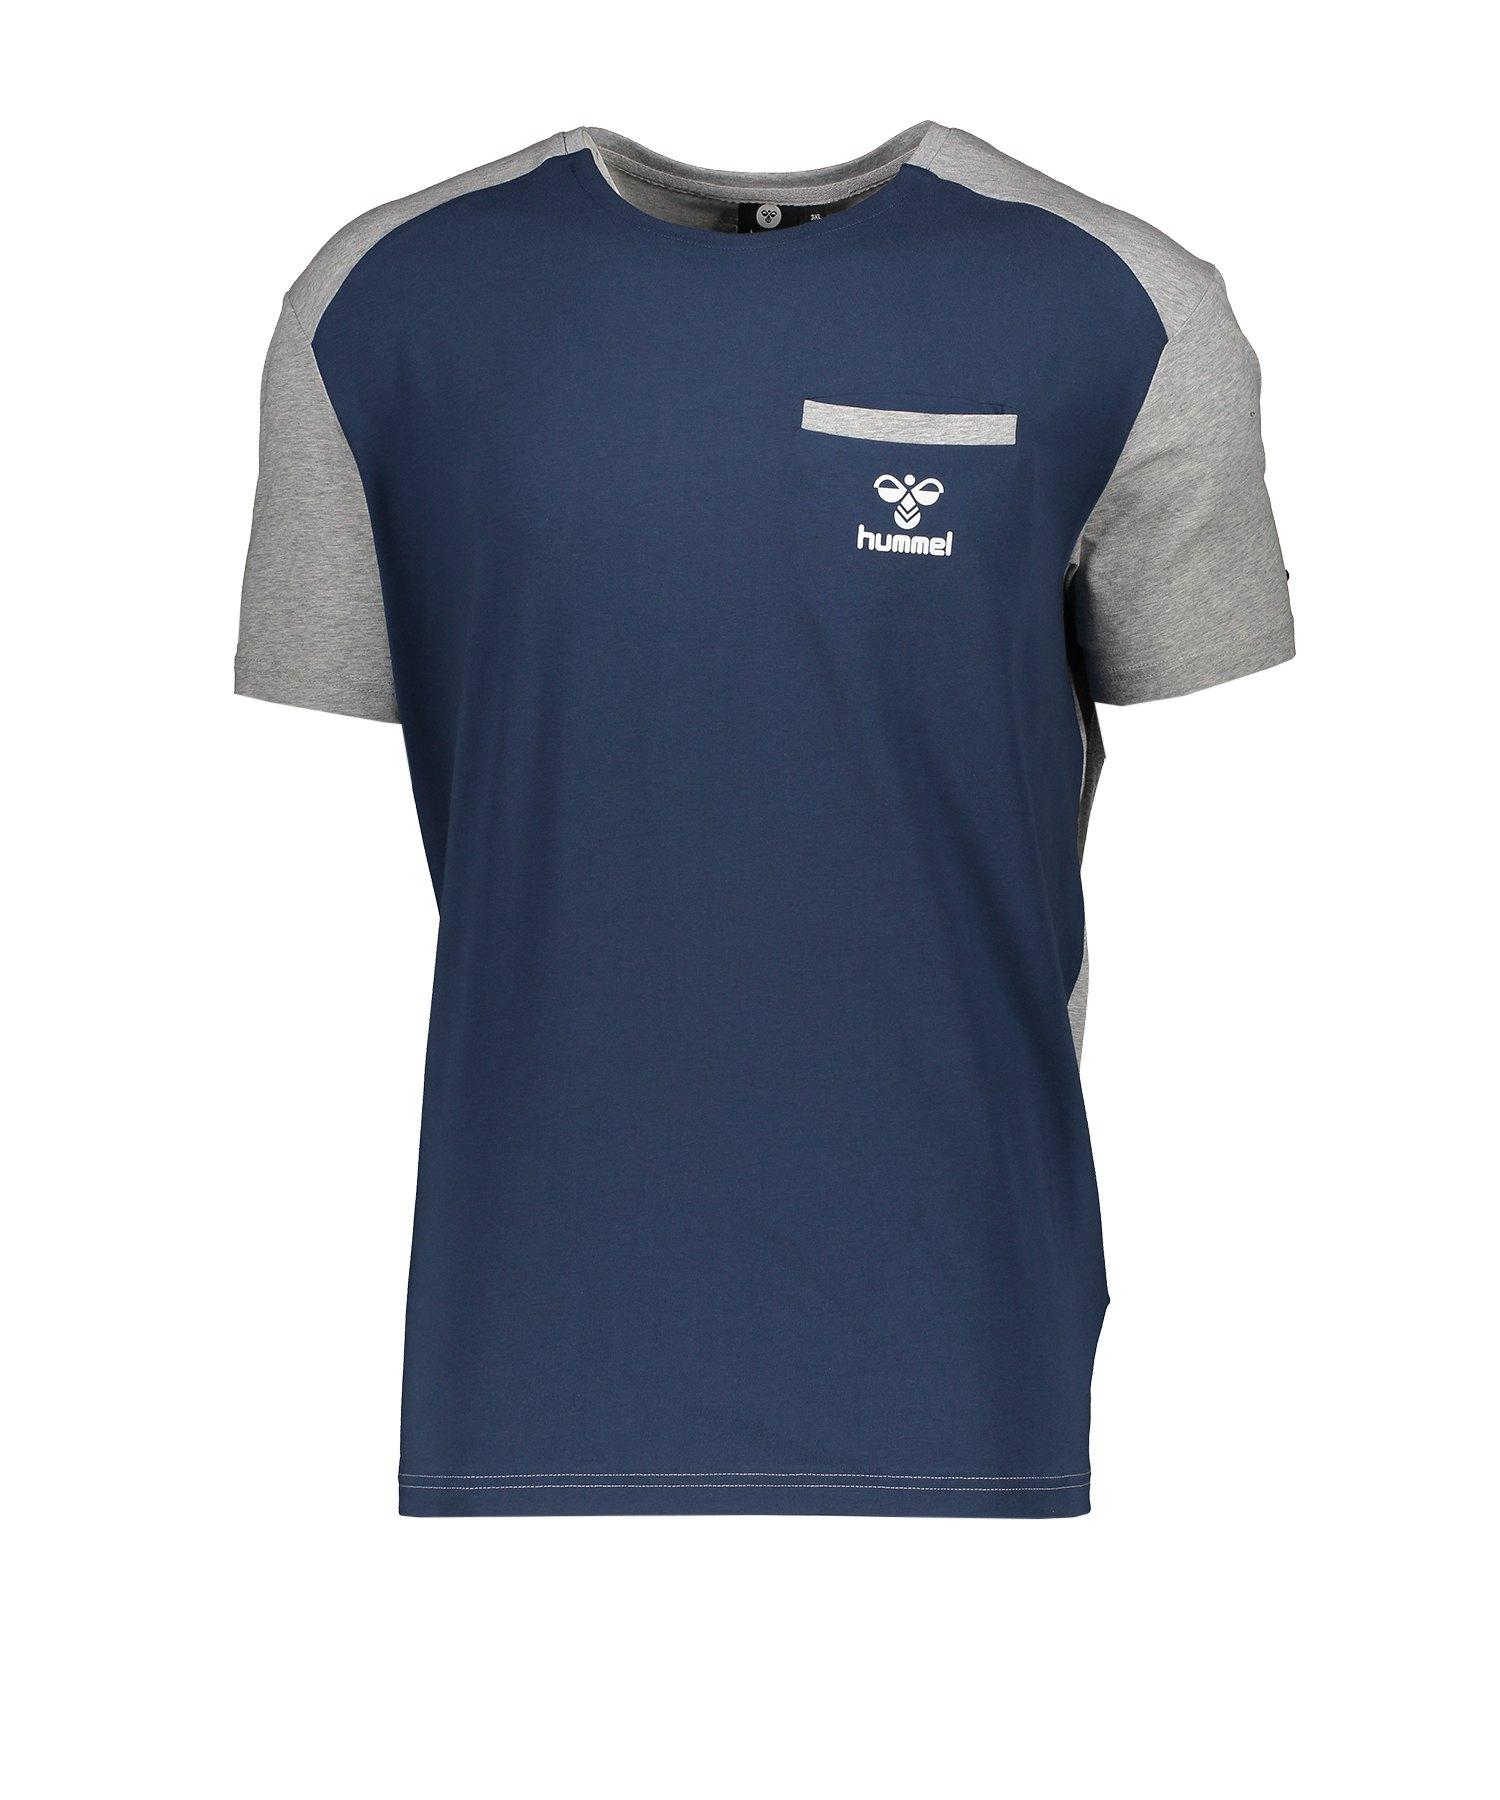 Hummel Flint T-Shirt kurzarm Blau Grau F8744 - blau